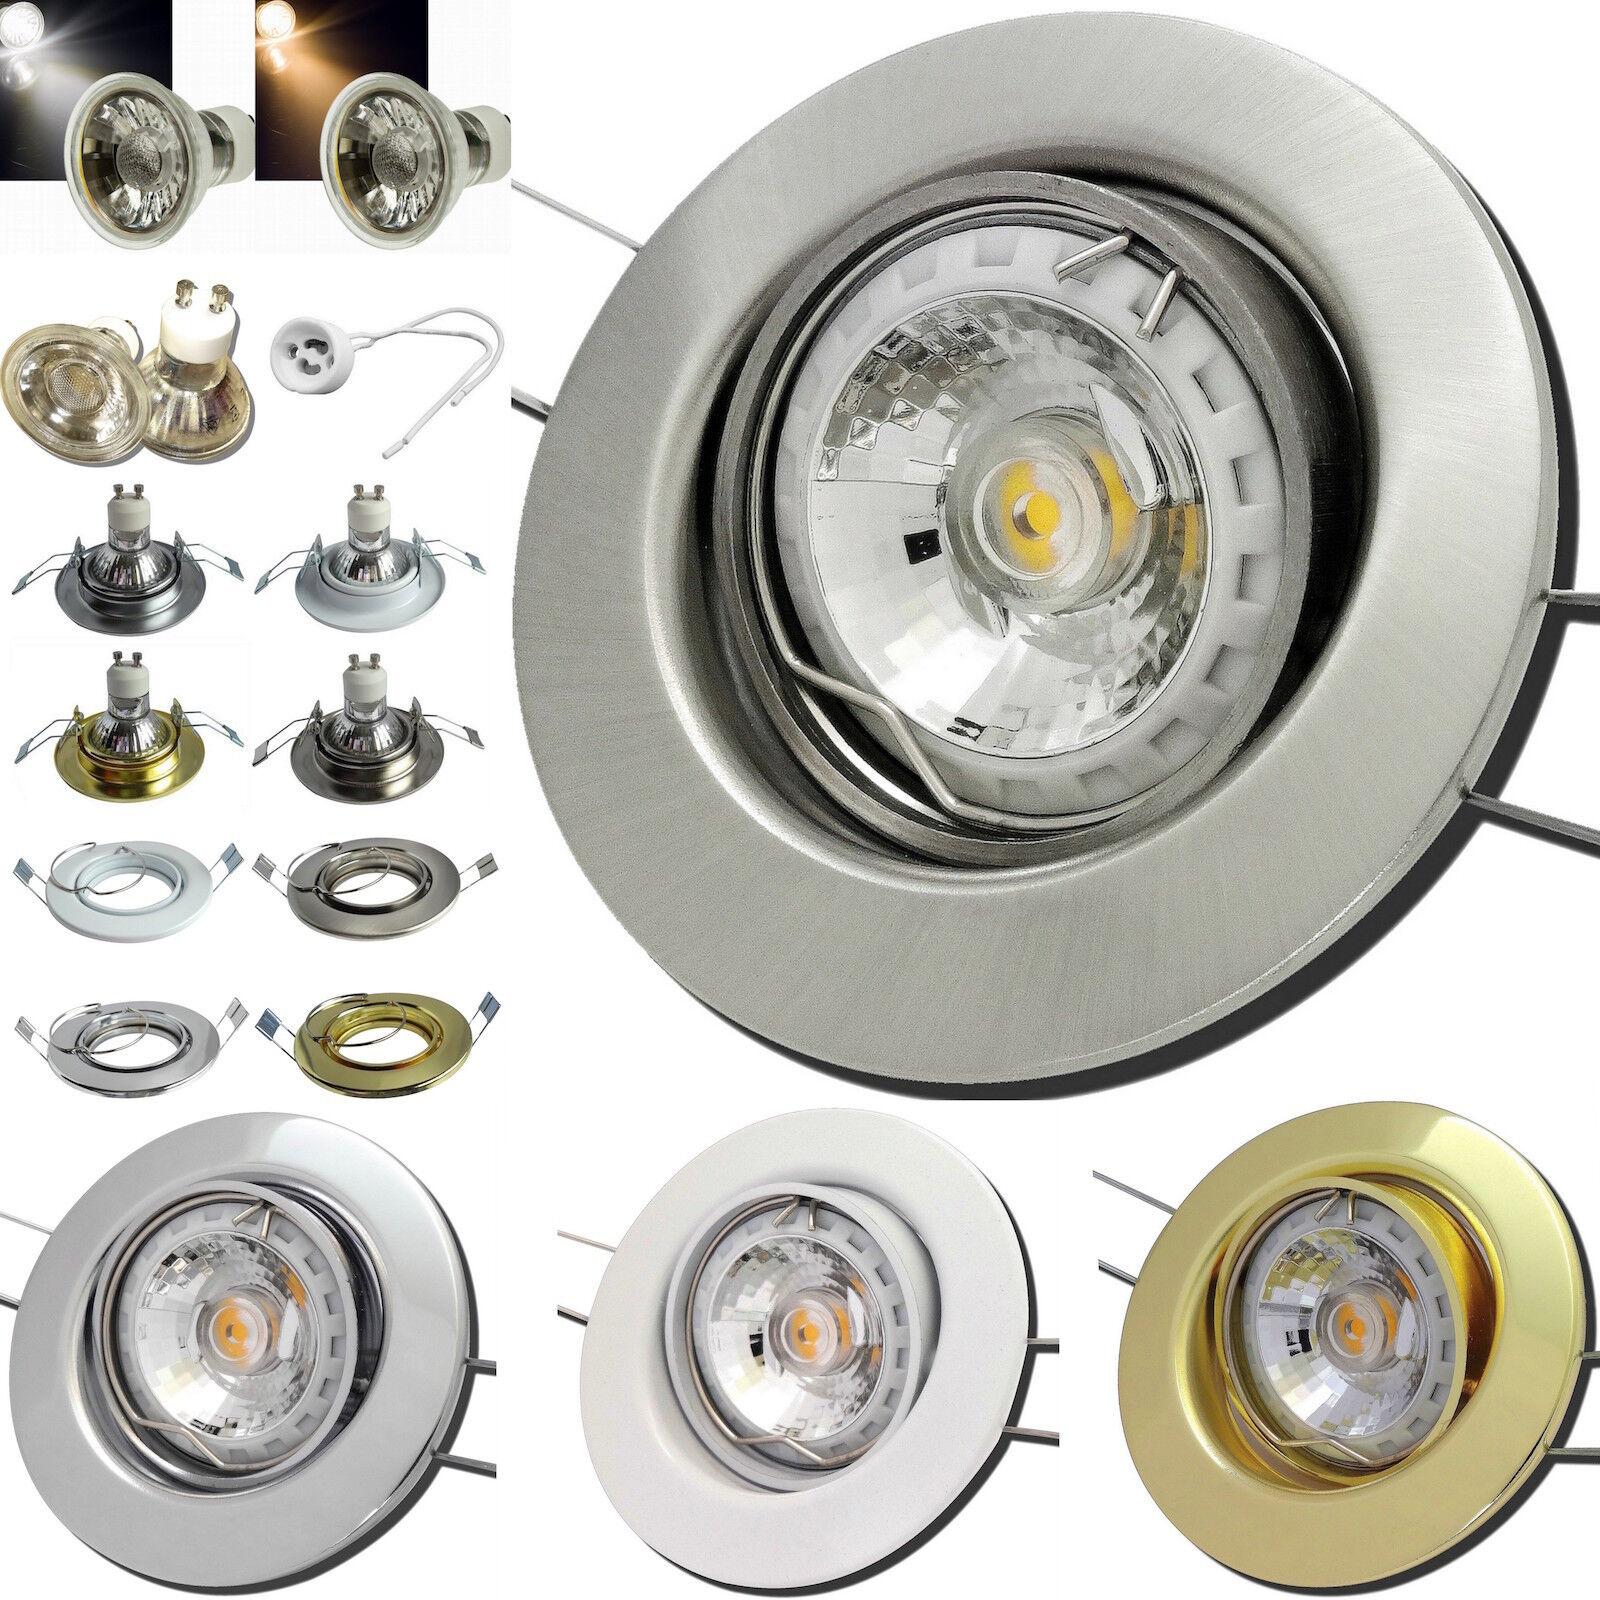 LED Einbauspots Lucy 230V   7W   Stufenlos Dimmbar   Bohrloch 68mm   Gu10 Lampen